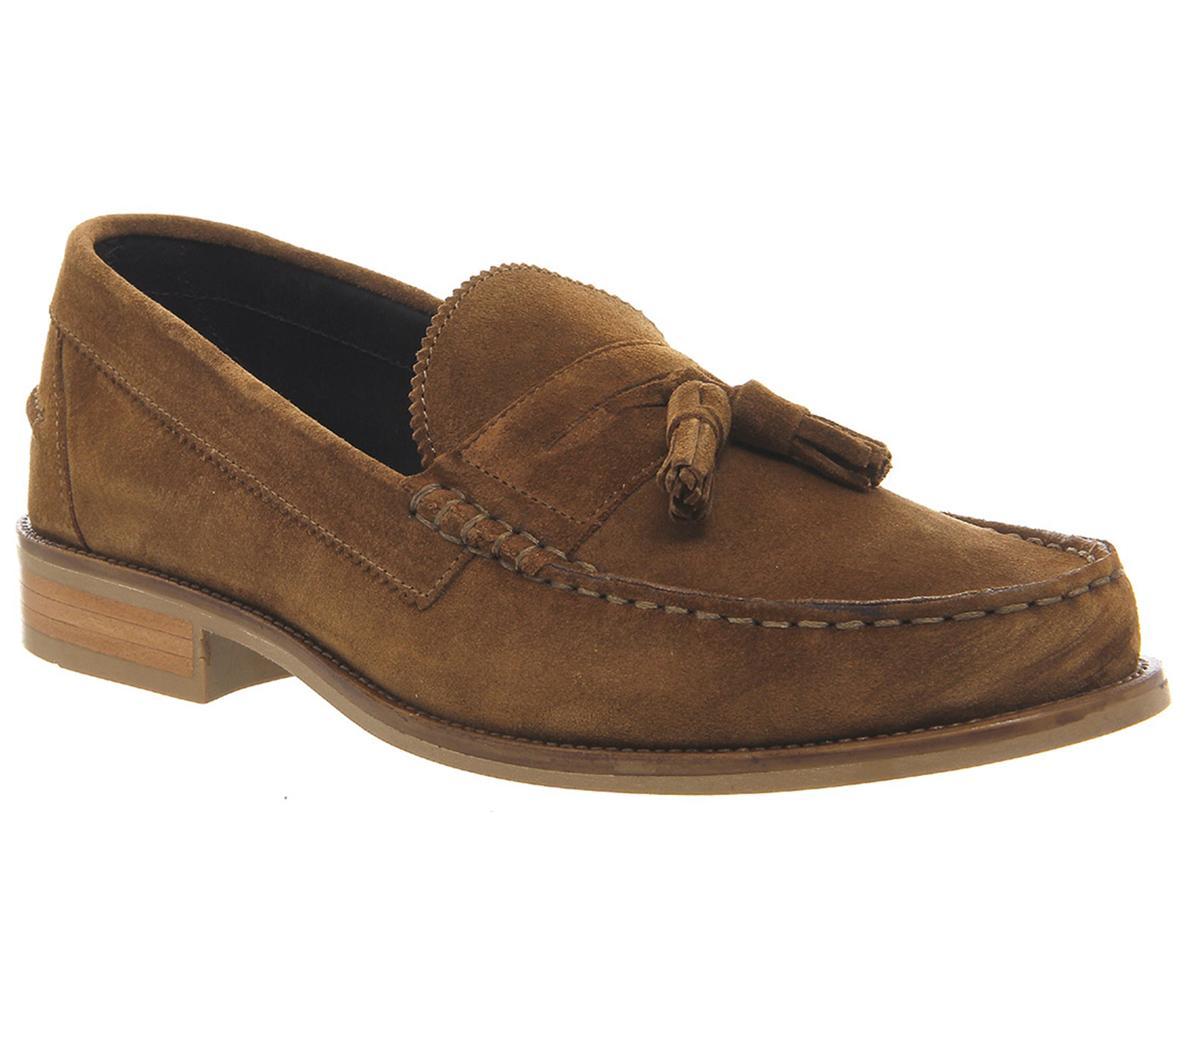 Bonjourno Tassel Loafers